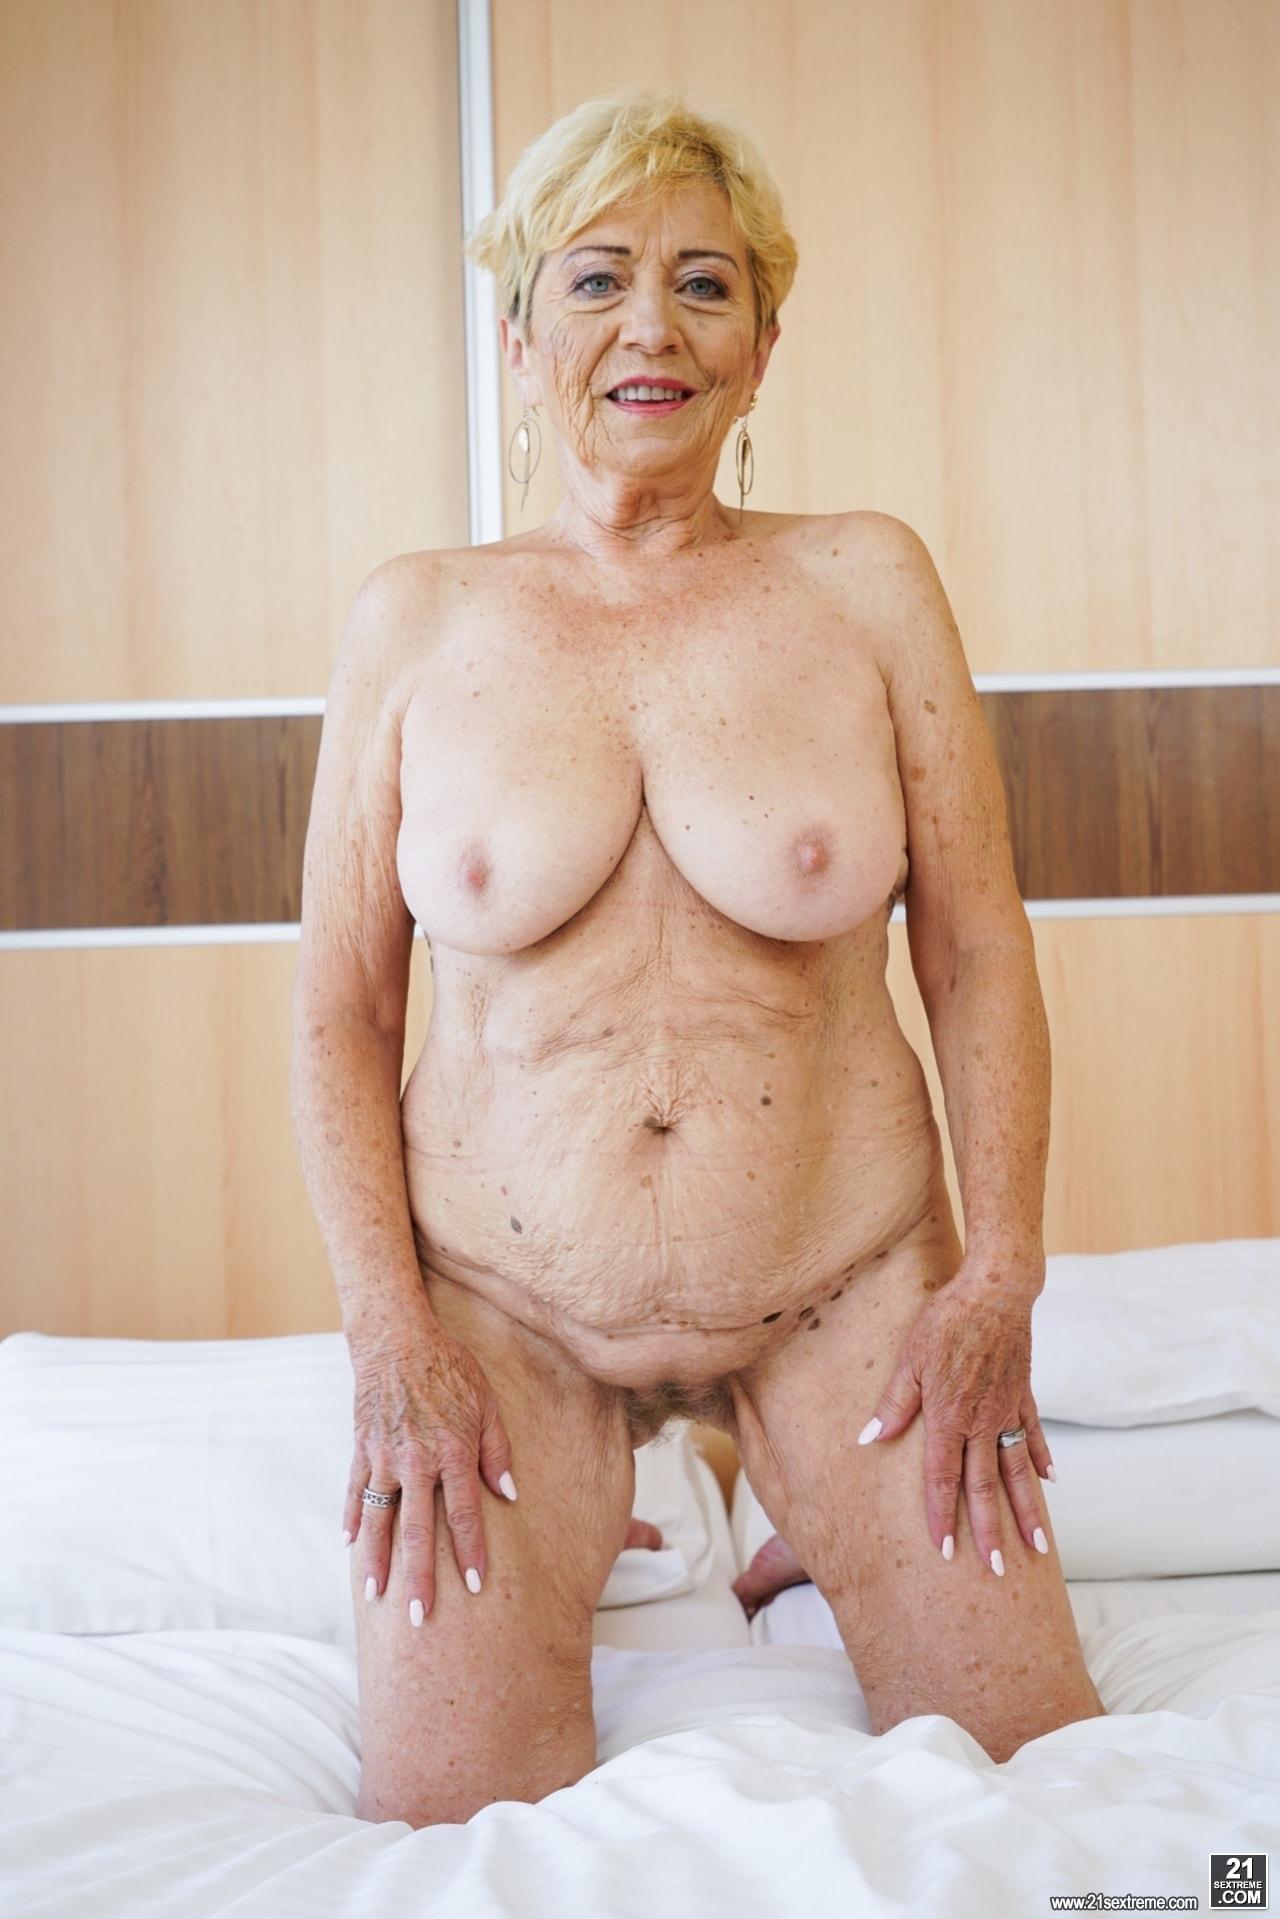 image Juicy long dick men movietures gay it039s not